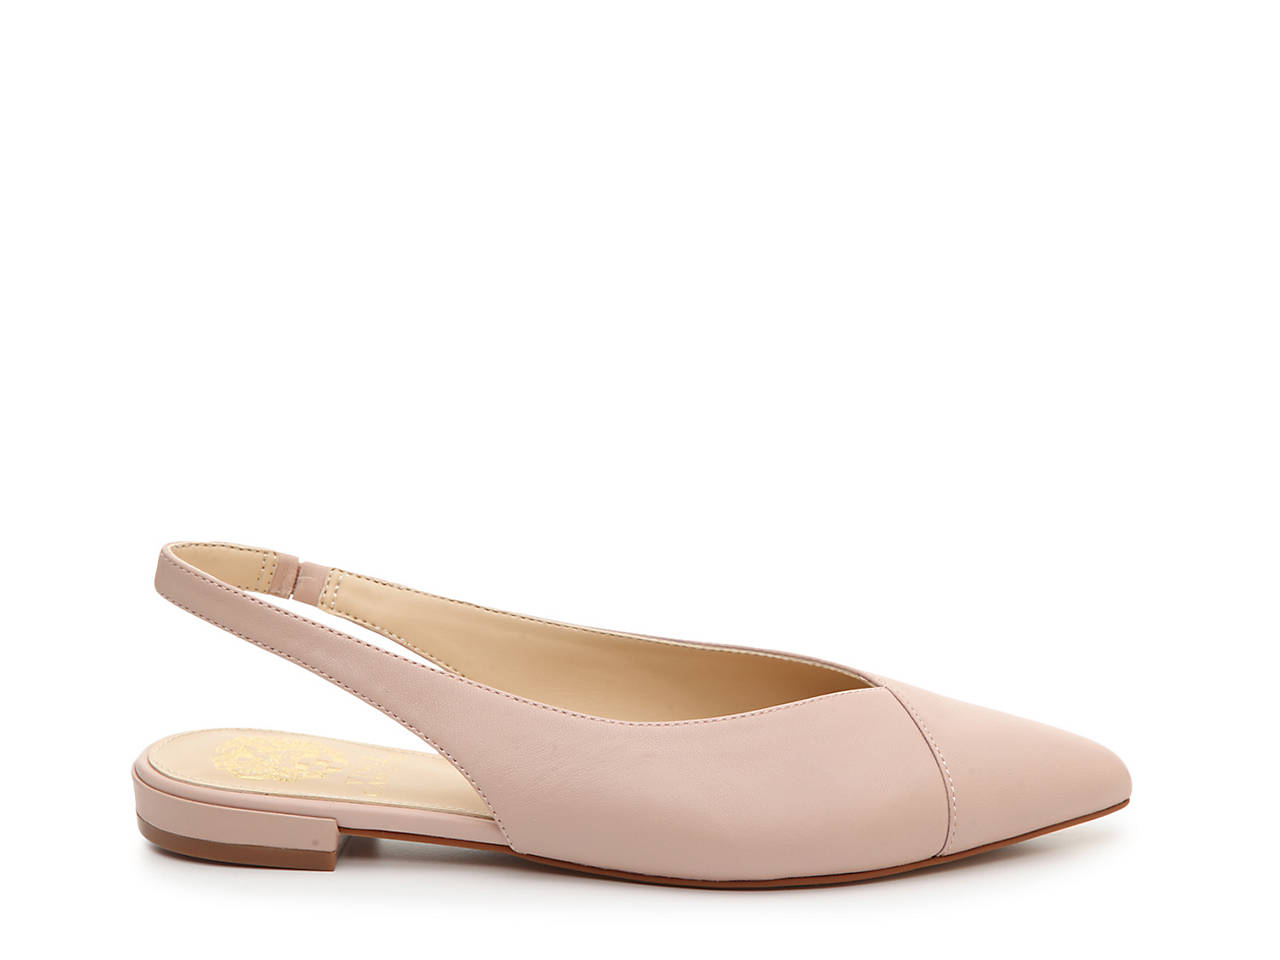 5b553d85a37 Vince Camuto Jasenia Flat Women s Shoes